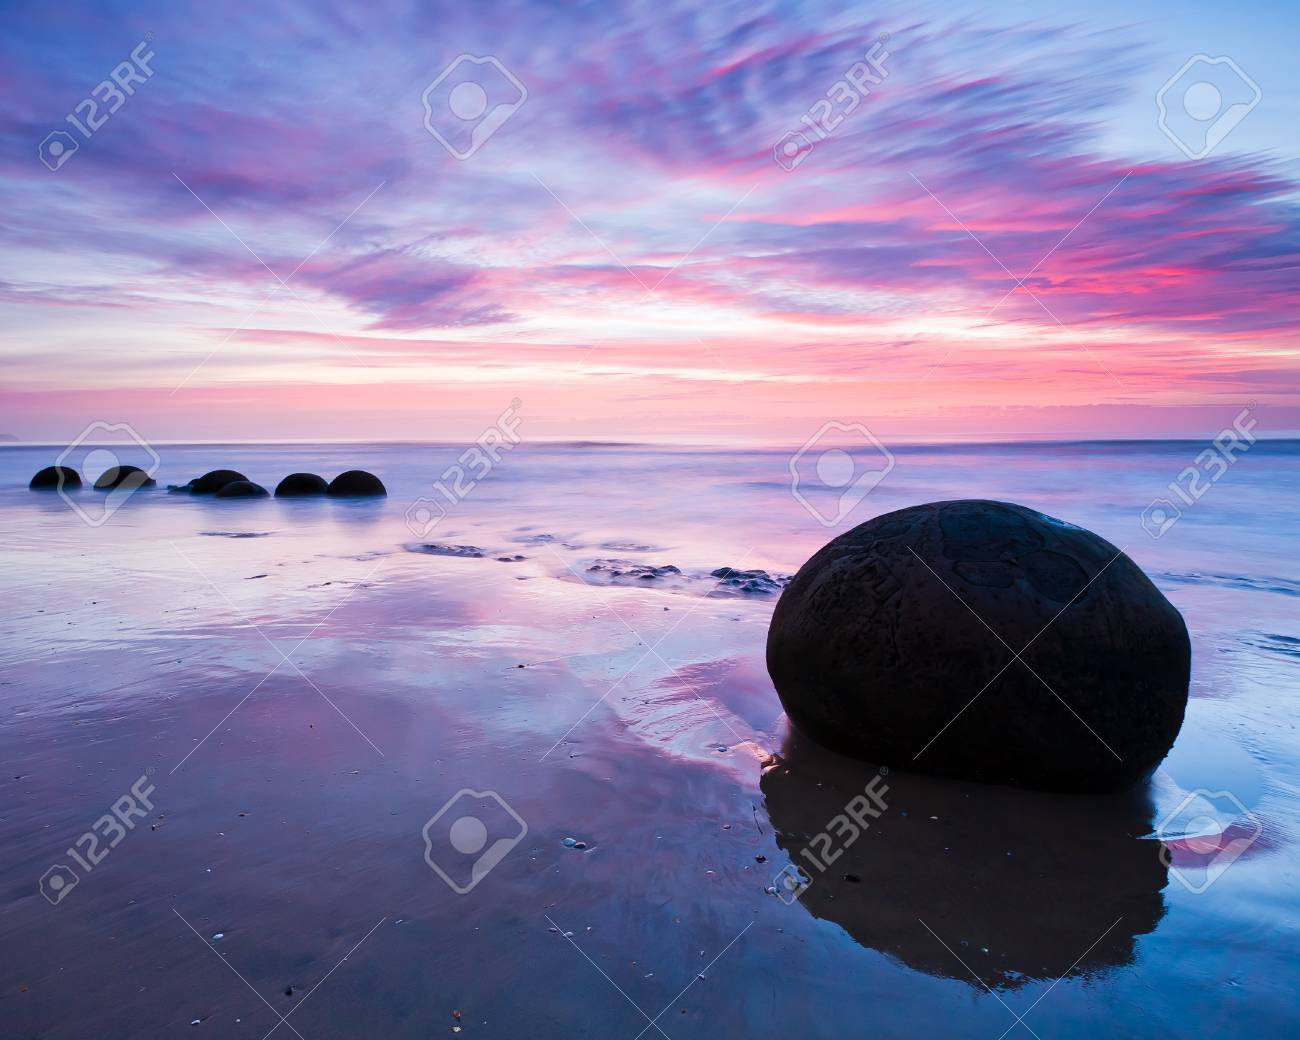 Moeraki Boulders at Dawn South Island New Zealand Stock Photo - 13210889